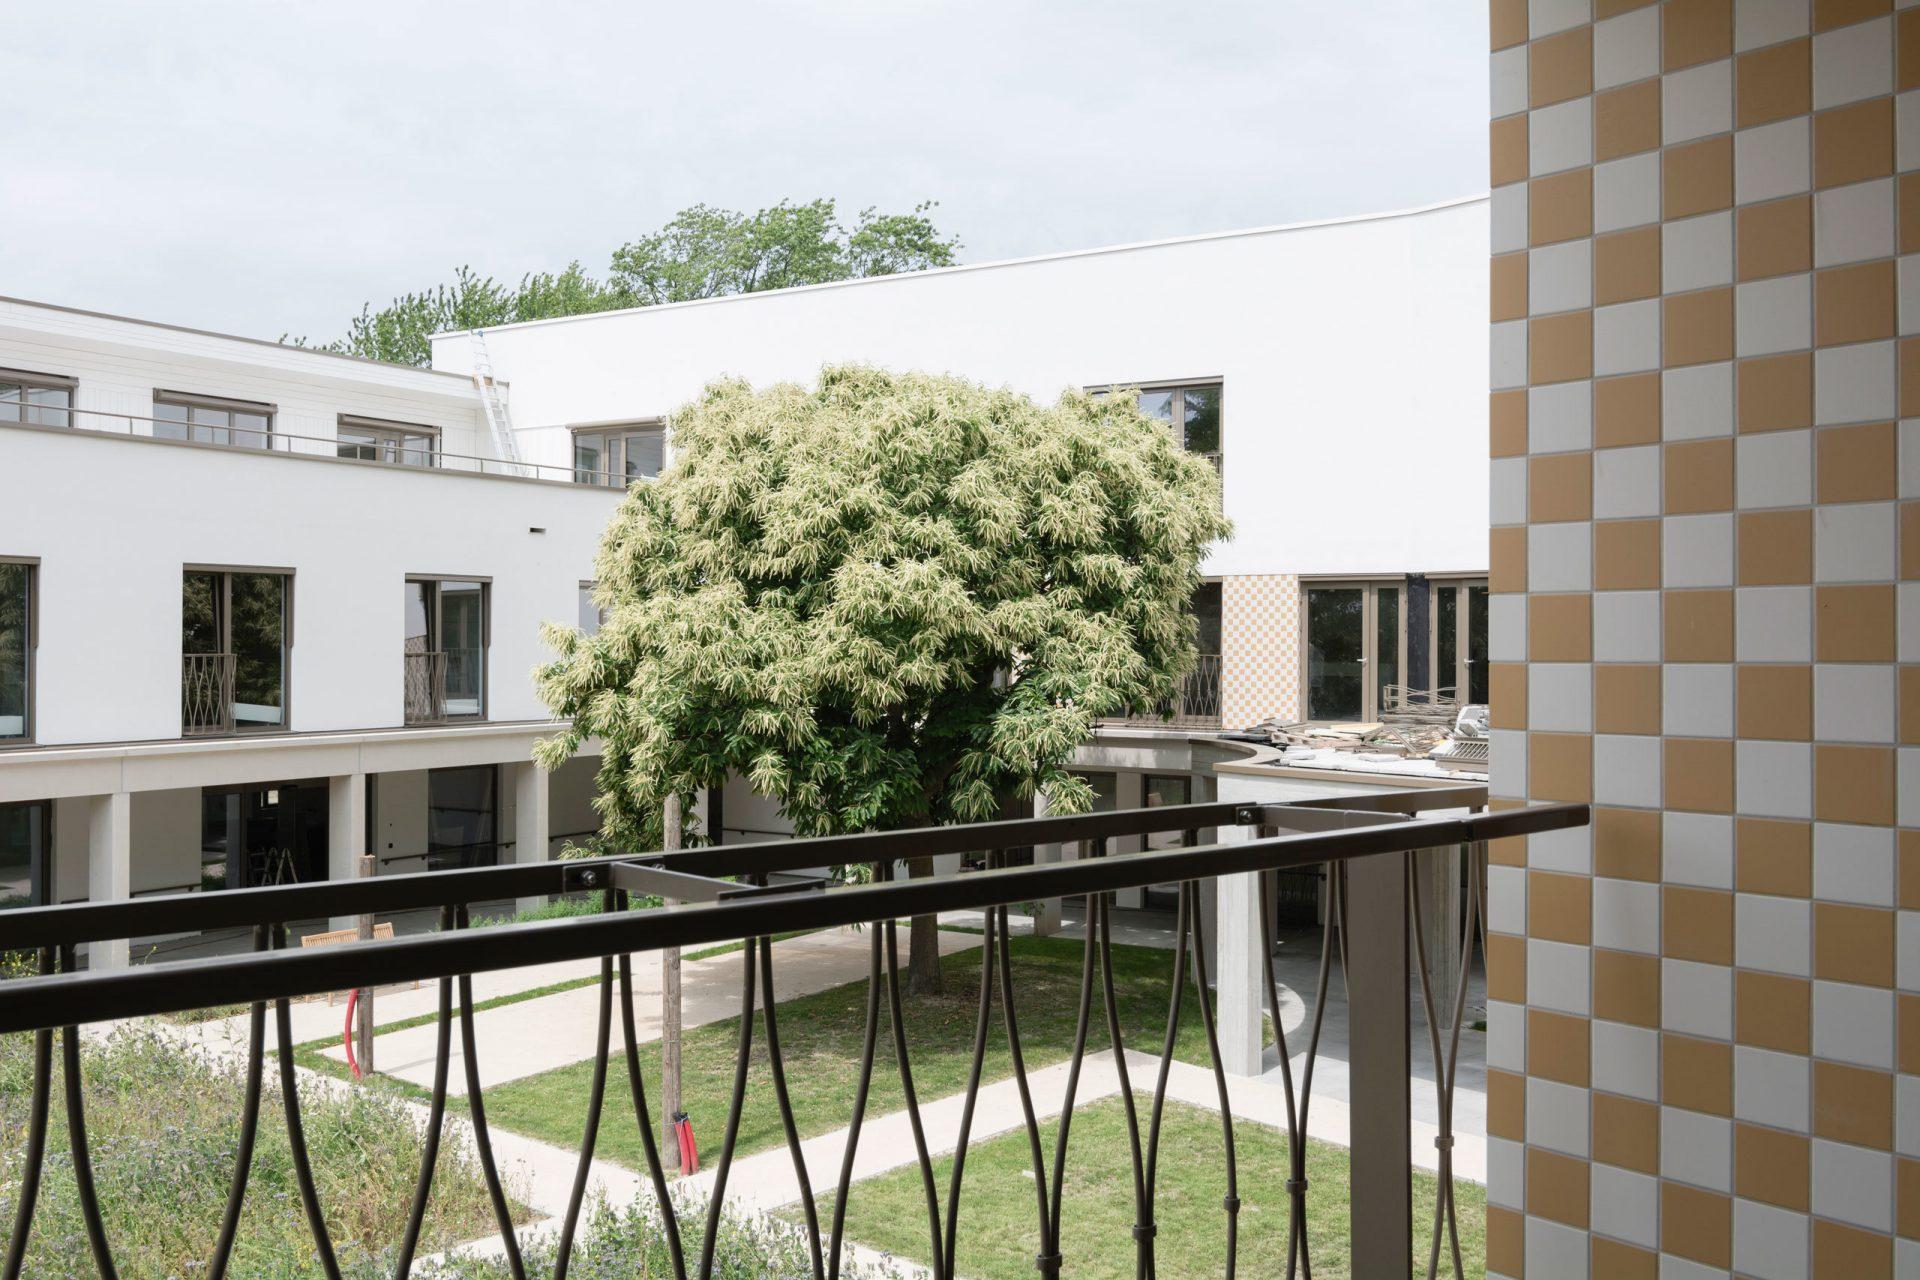 Machelen Garden Tiles